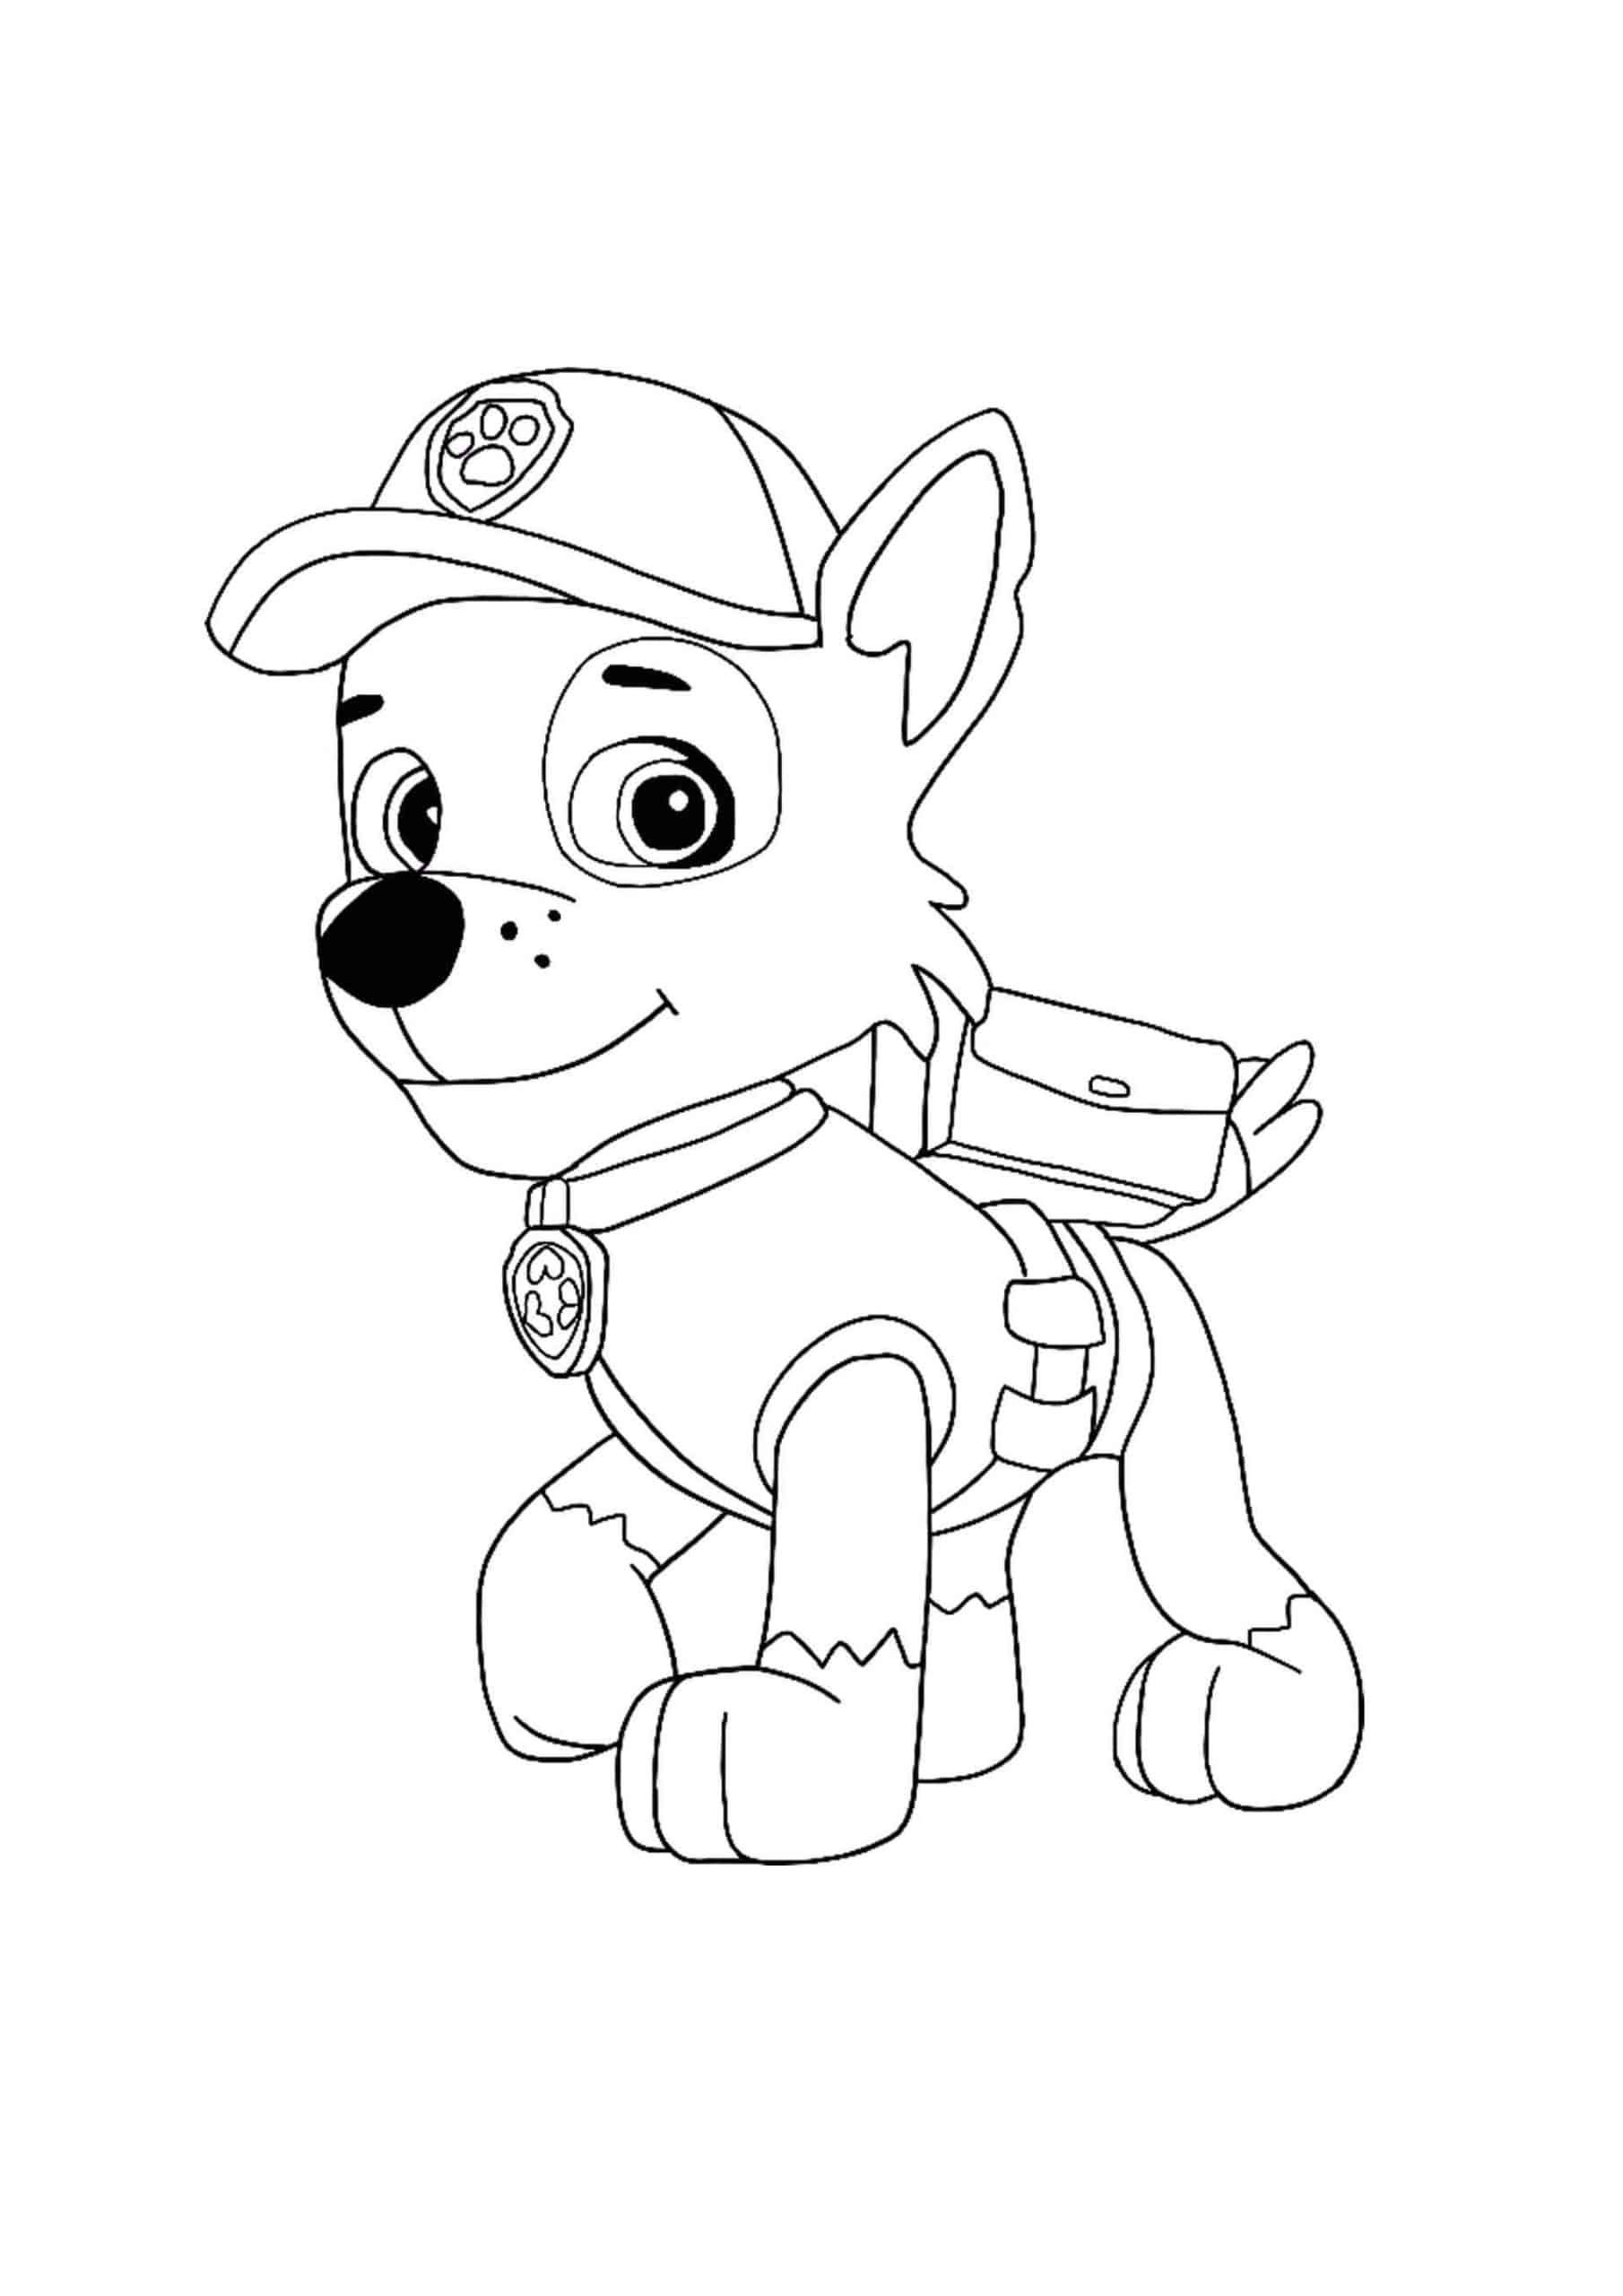 Paw Patrol Rocky Coloring Page Paw Patrol Coloring Paw Patrol Coloring Pages Paw Patrol Rocky